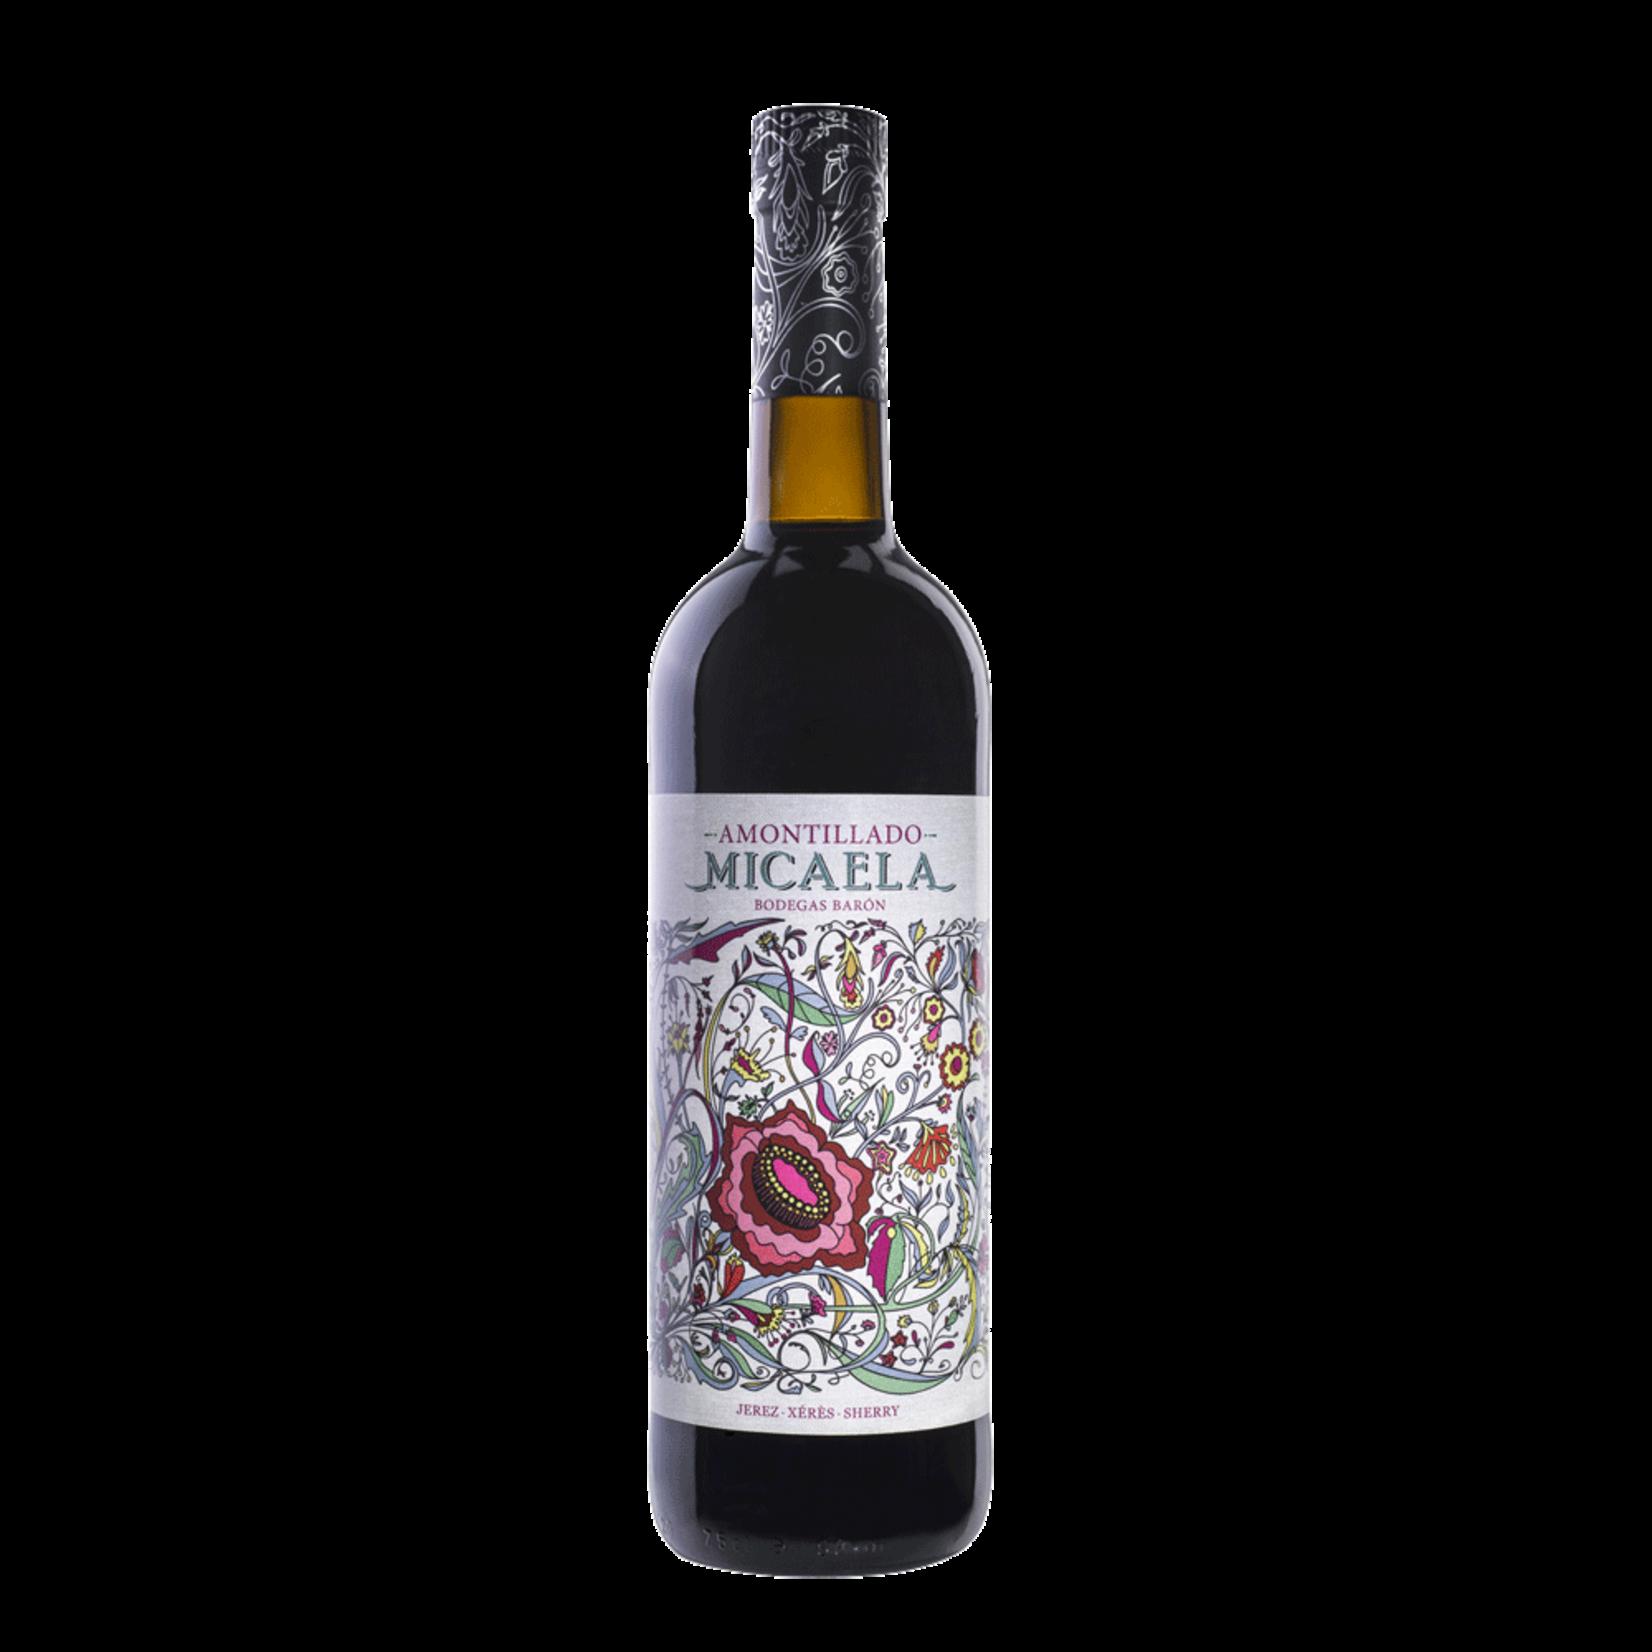 Wine Bodegas Baron Micaela Amontillado Sherry